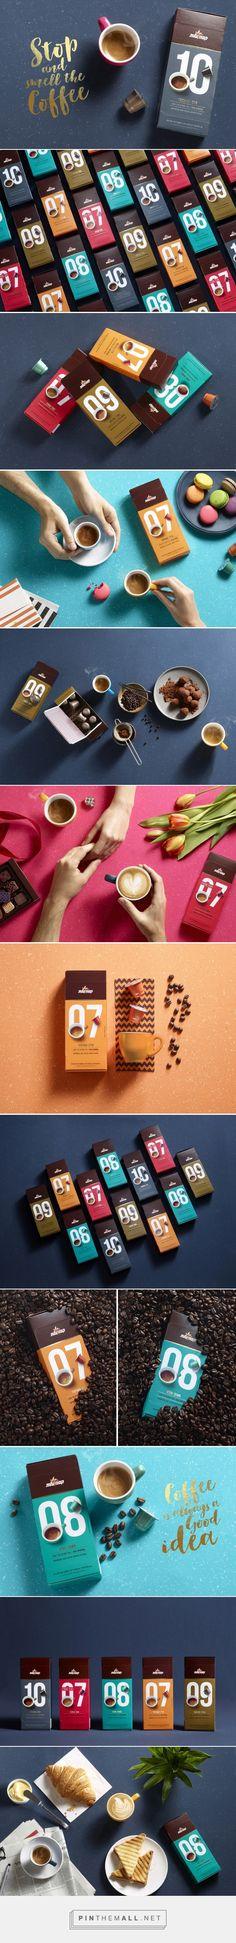 elite coffee capsules packaging designed by shake design maayan